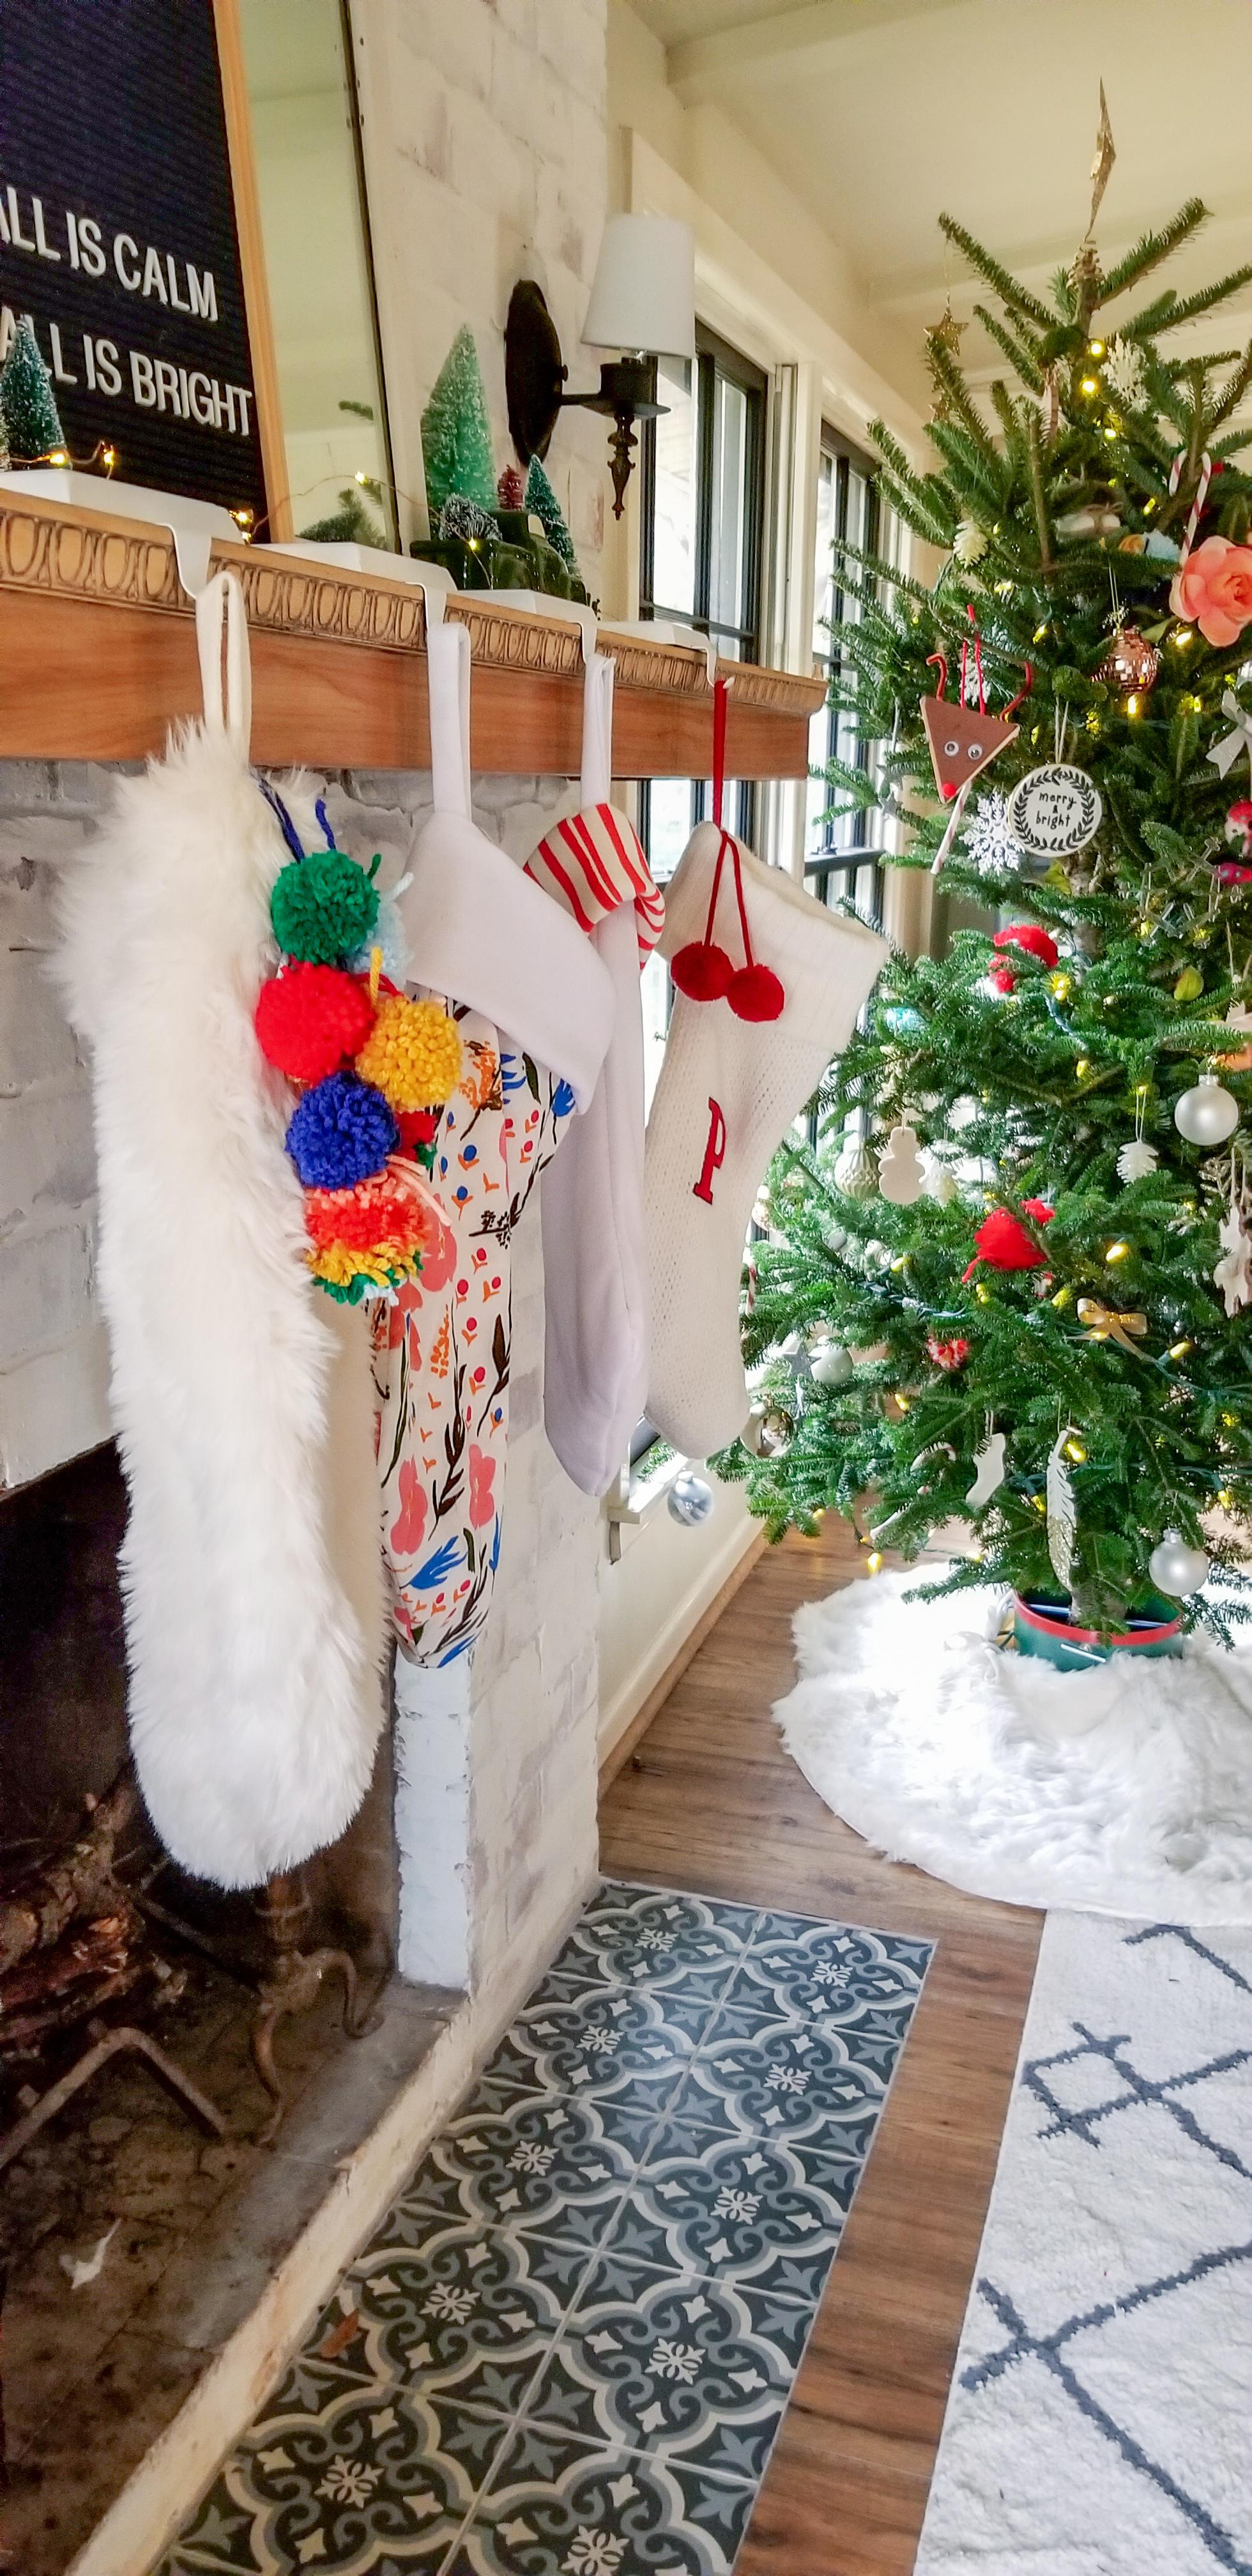 The Semi-Minimalist DIY Christmas Stockings After.1.jpeg